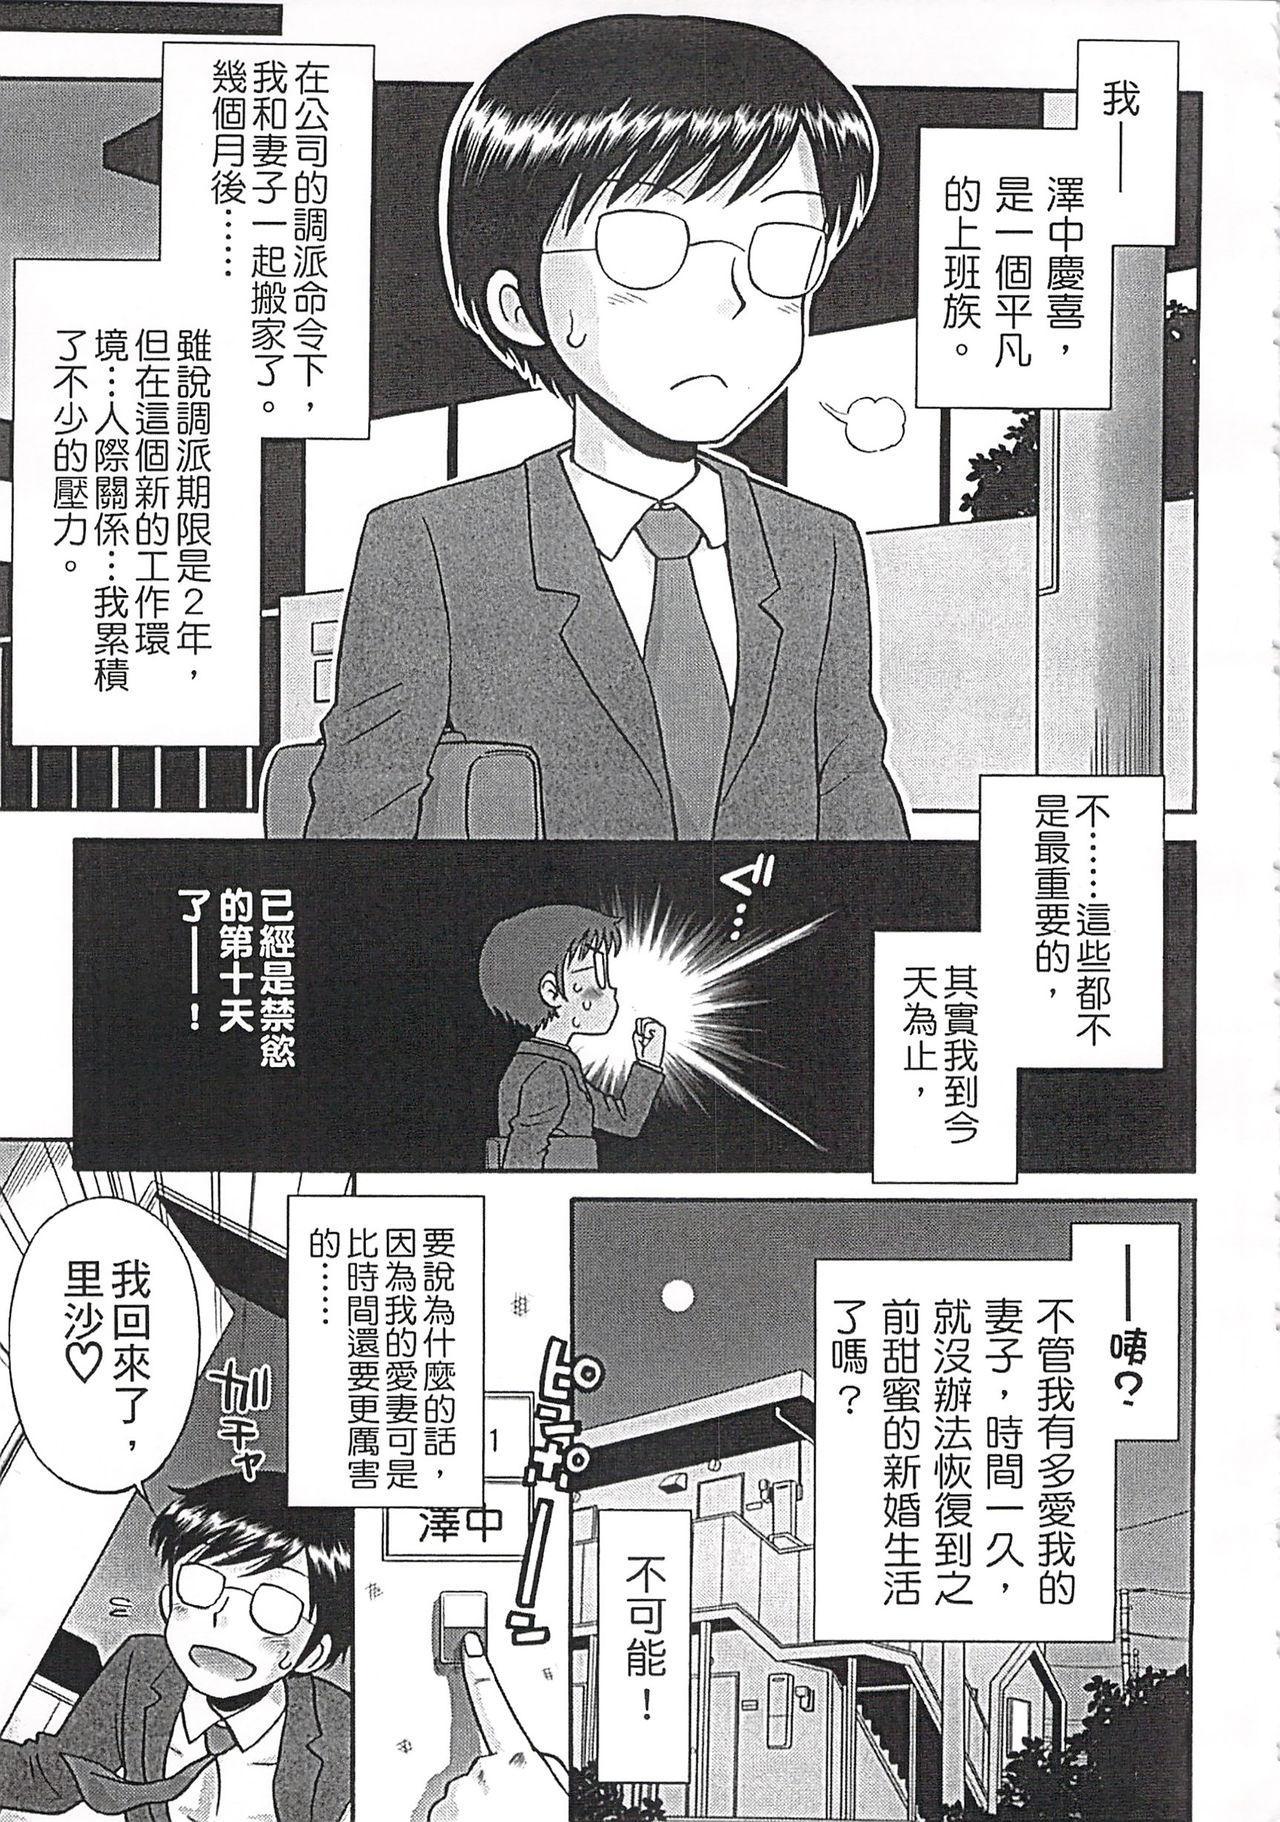 Kore demo Otona Desu Kedo!? Mrs.LOLITA Kanzenban   人家是大人啦! ~Mrs.LOLITA完全版 116